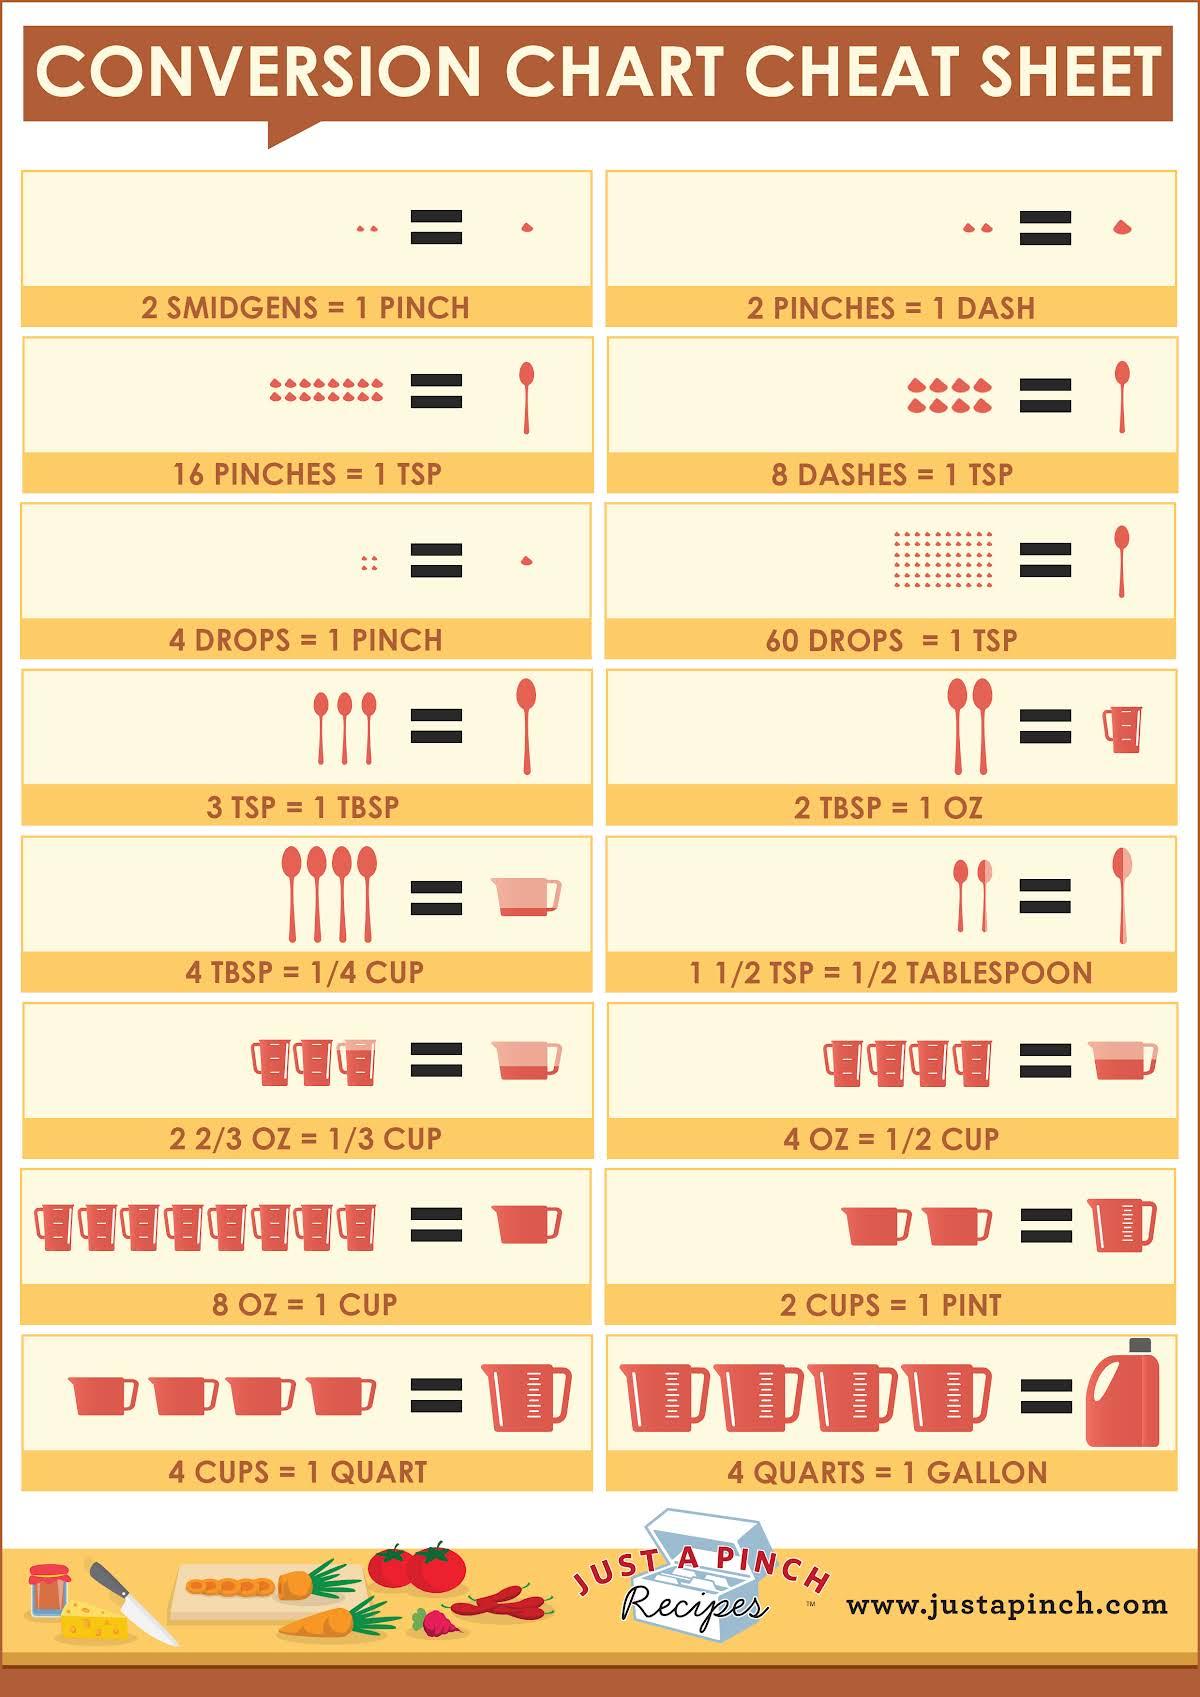 Food Bites Conversion Chart Cheat Sheet